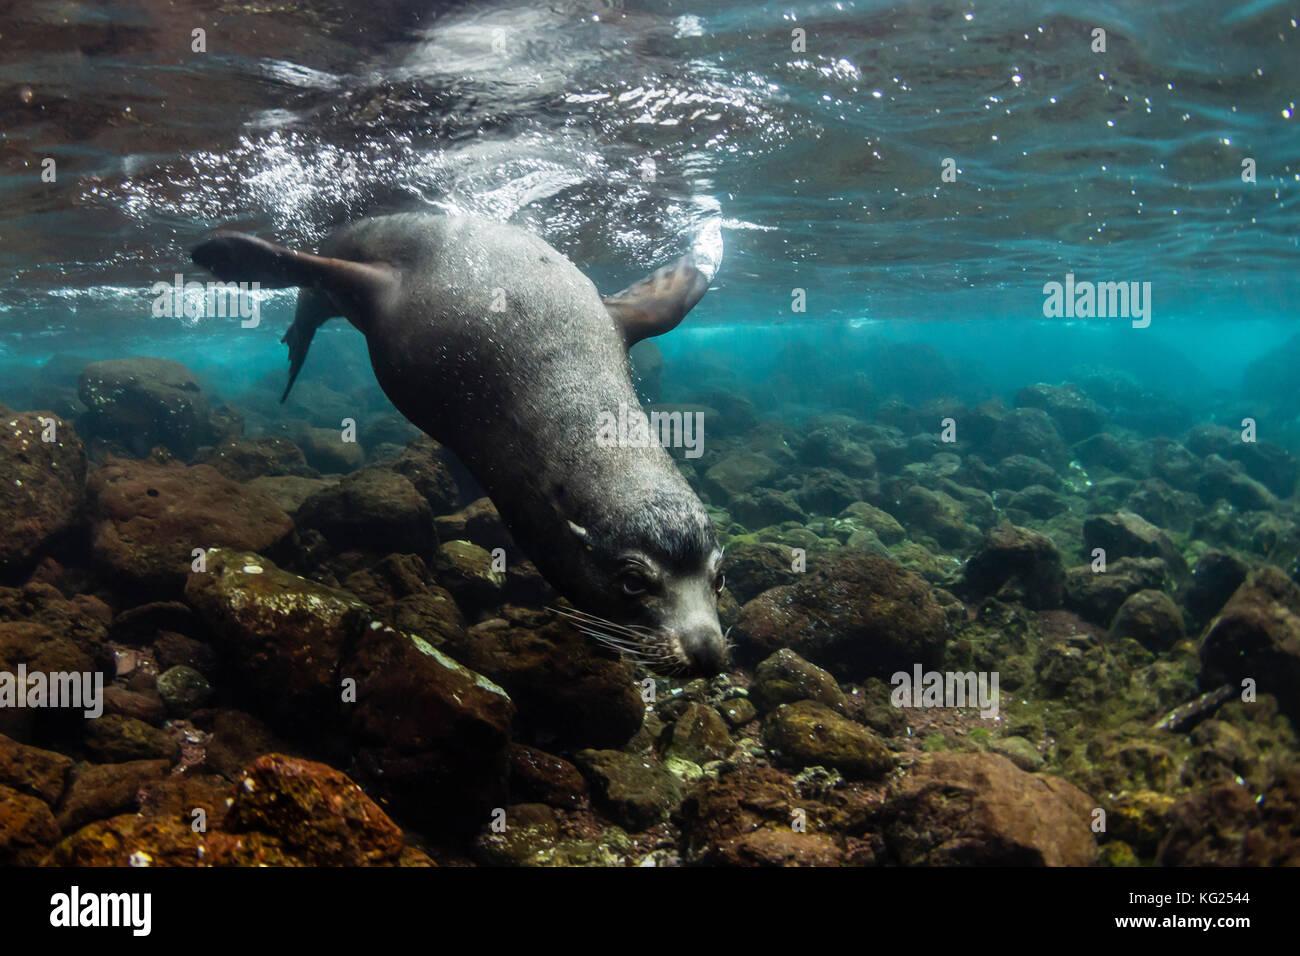 Bull Galapagos sea lion (Zalophus wollebaeki) underwater at Santiago Island, Galapagos, Ecuador, South America - Stock Image